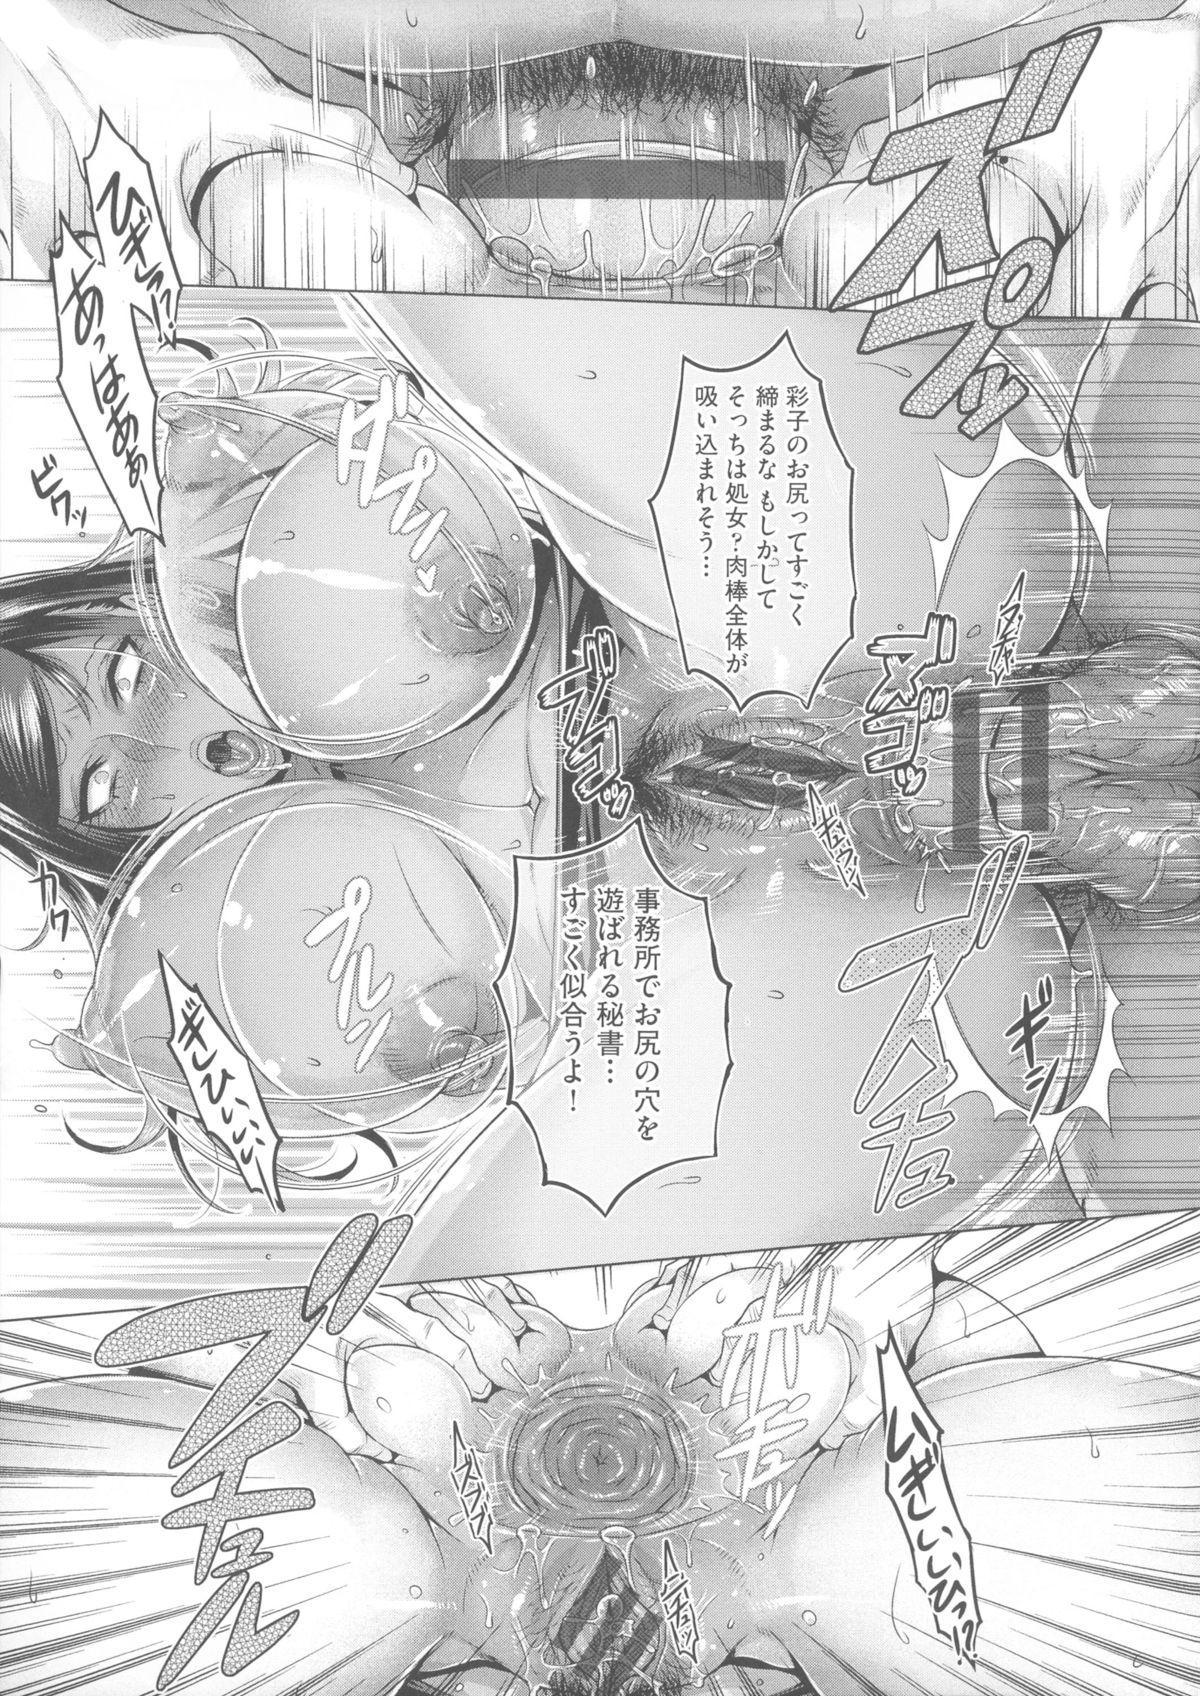 Chijou no Kiwami - Extremity of the blind love 22